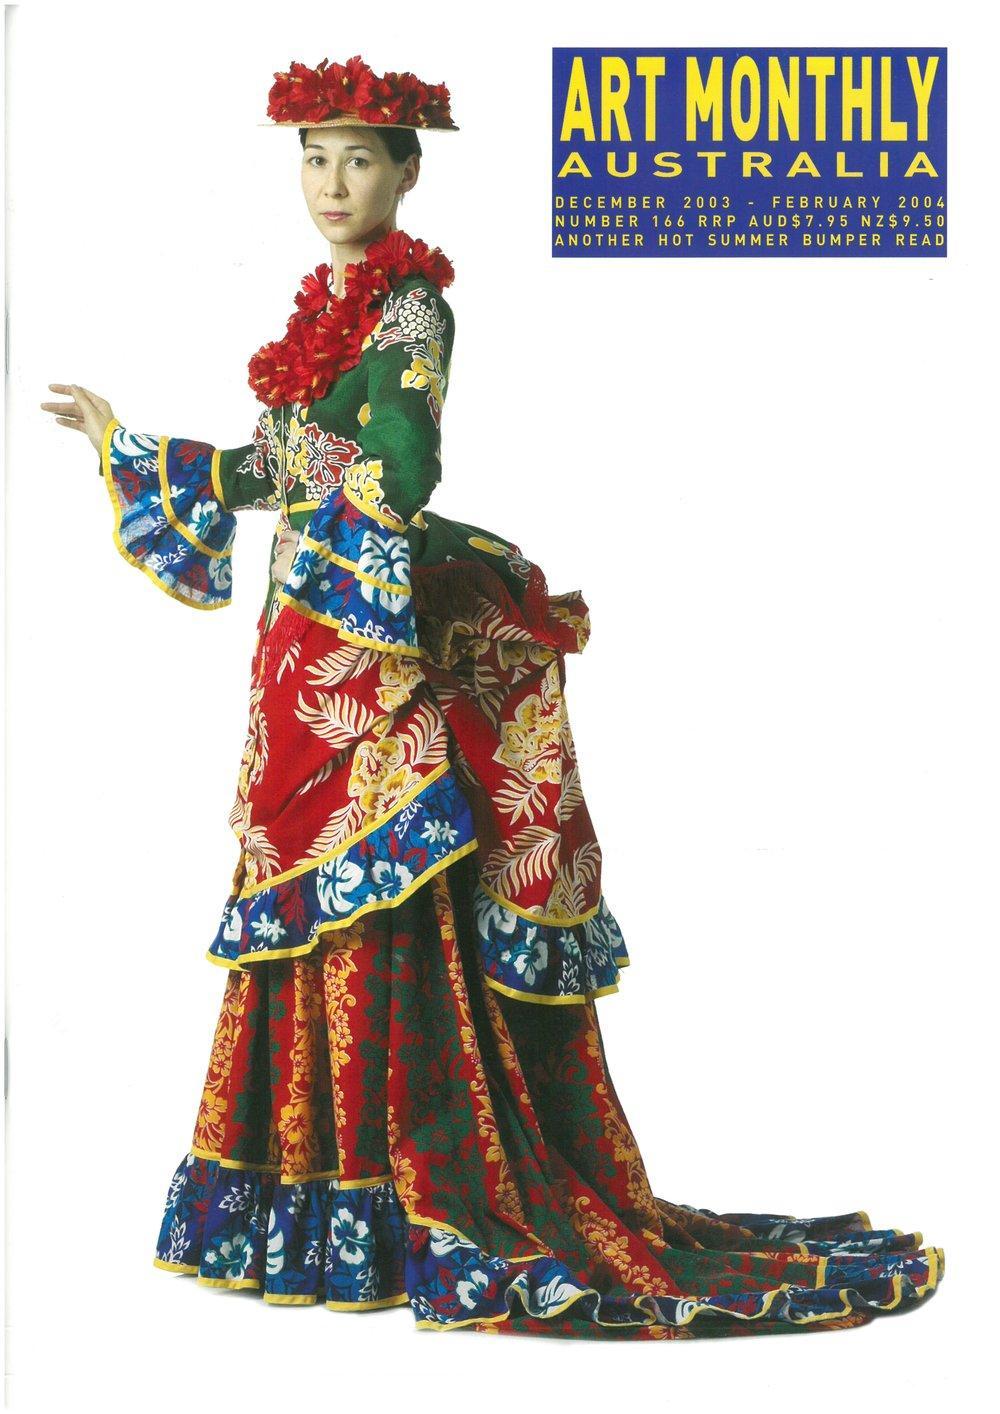 Issue 166 December 2003 - February 2004